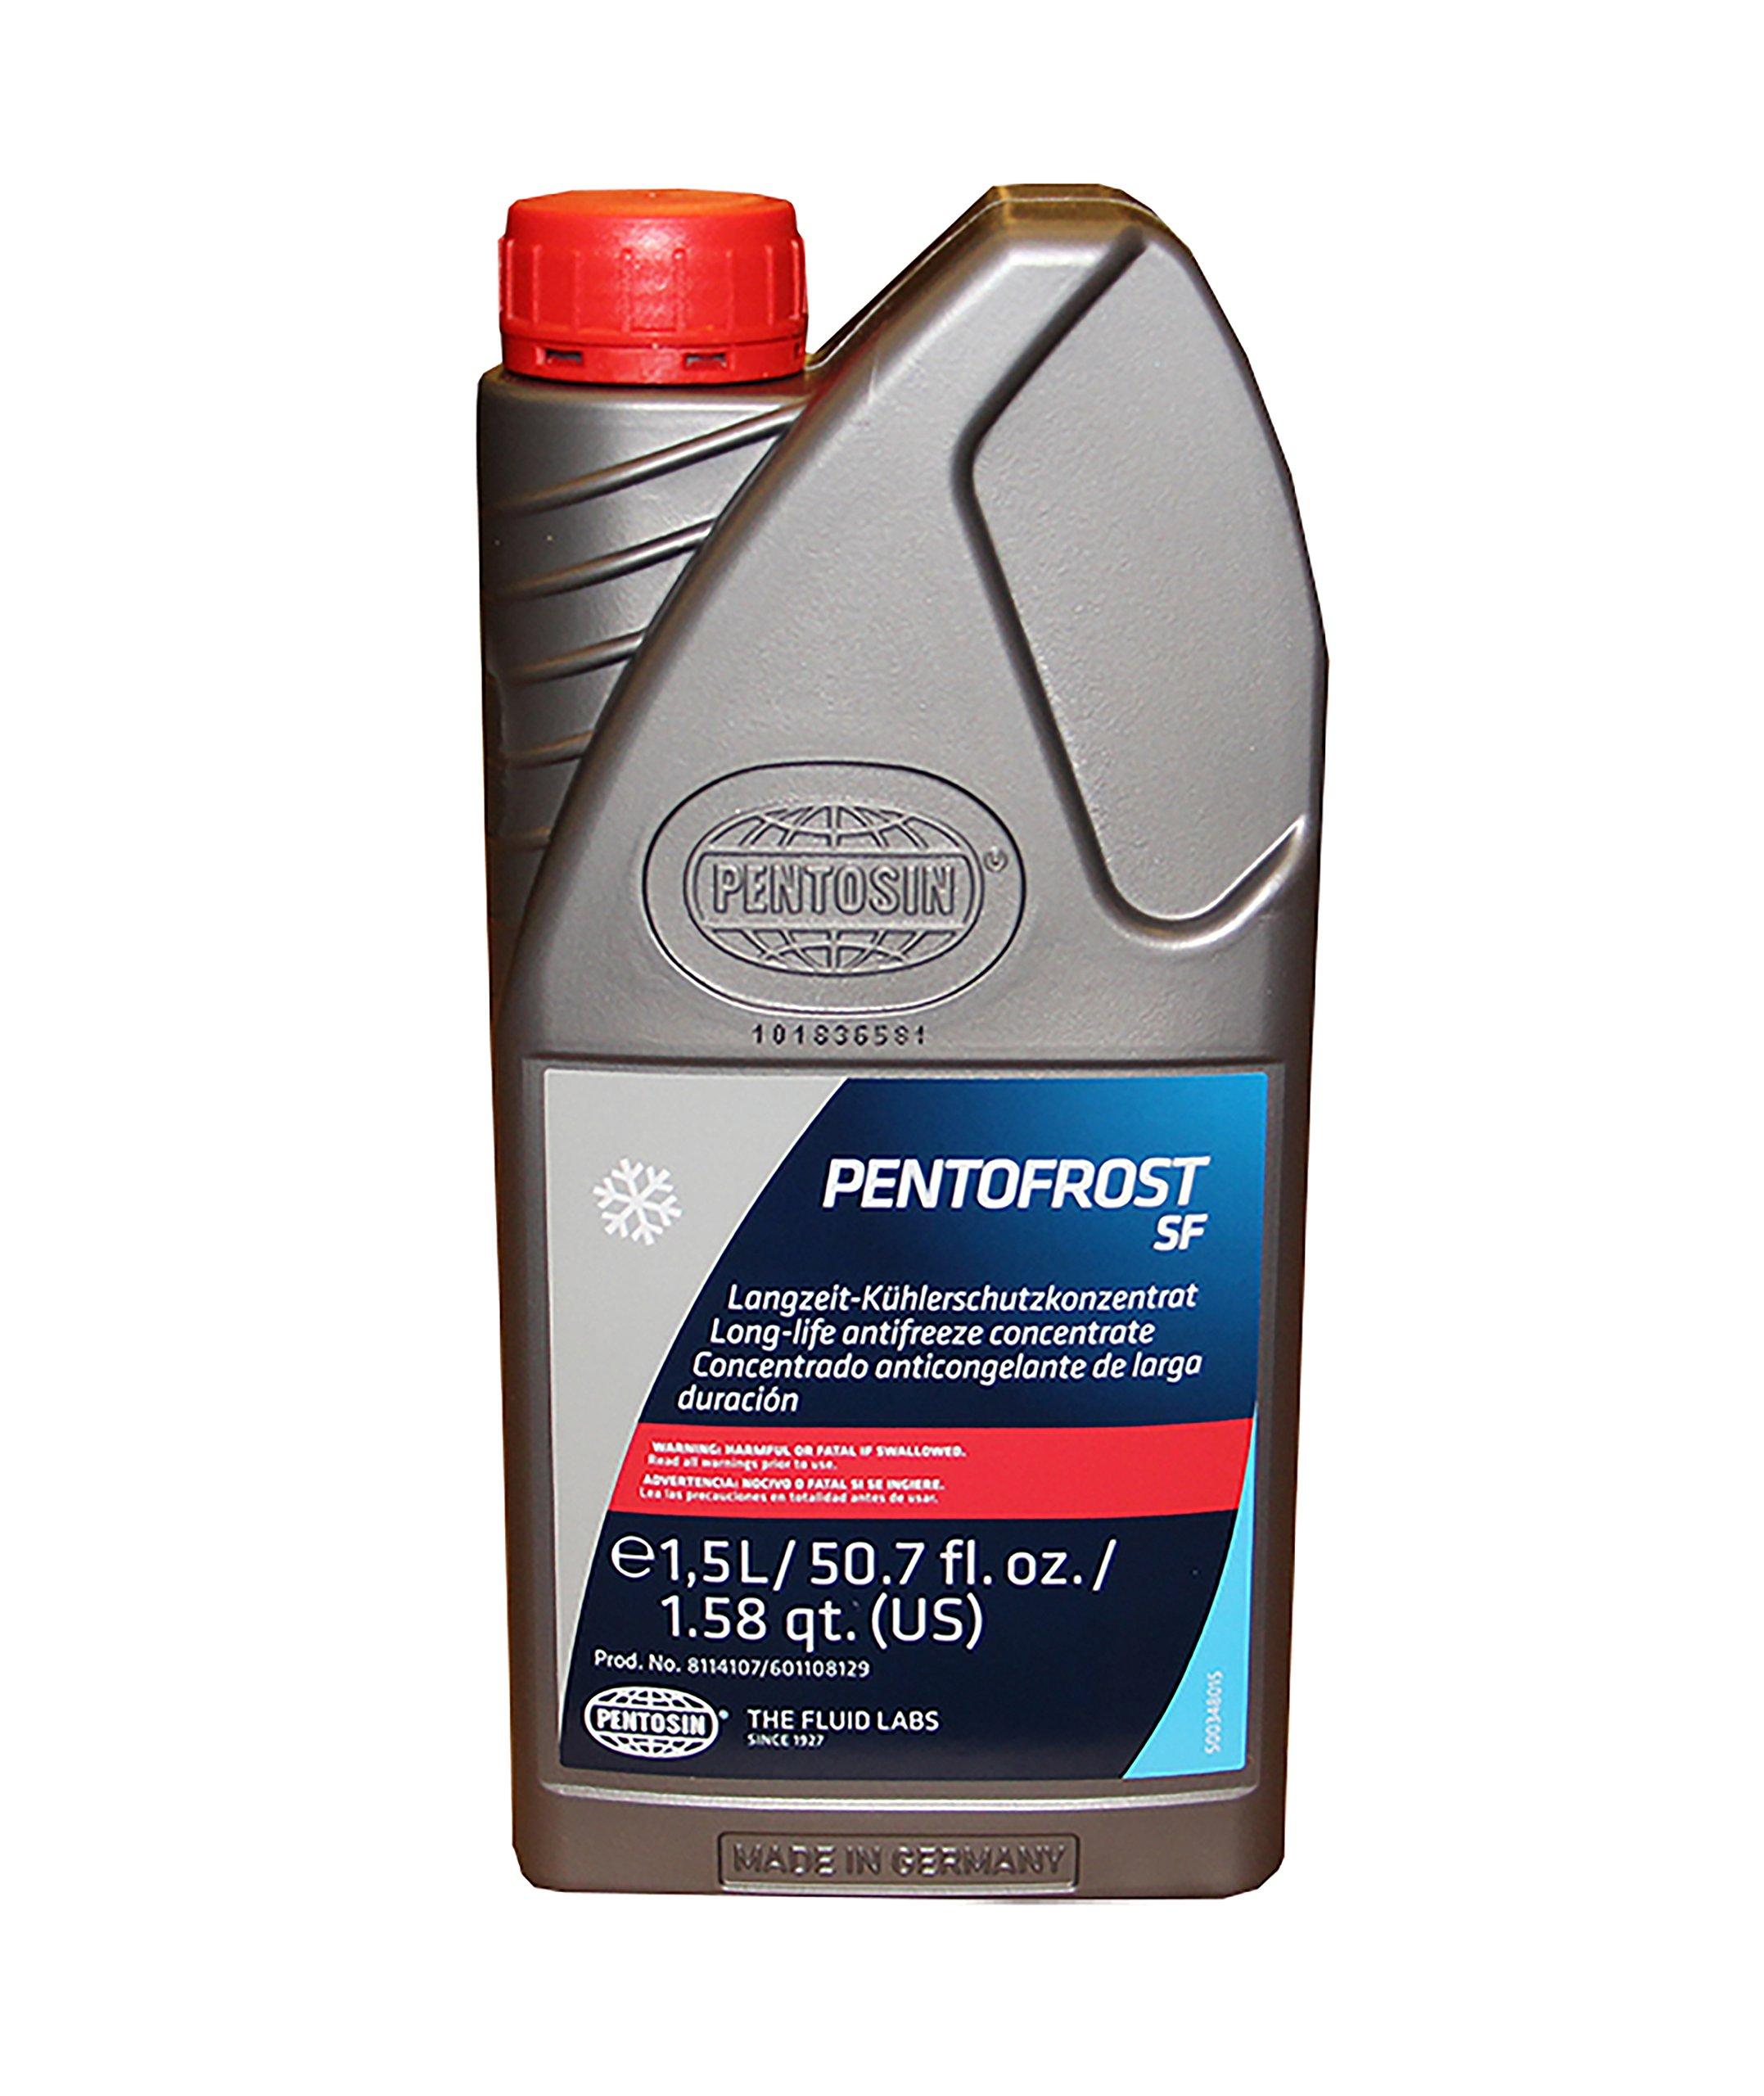 Pentosin 8114107-C Pentofrost SF Silicate Free Antifreeze, 1.5 Liter  (Case of 12) by CRP Automotive